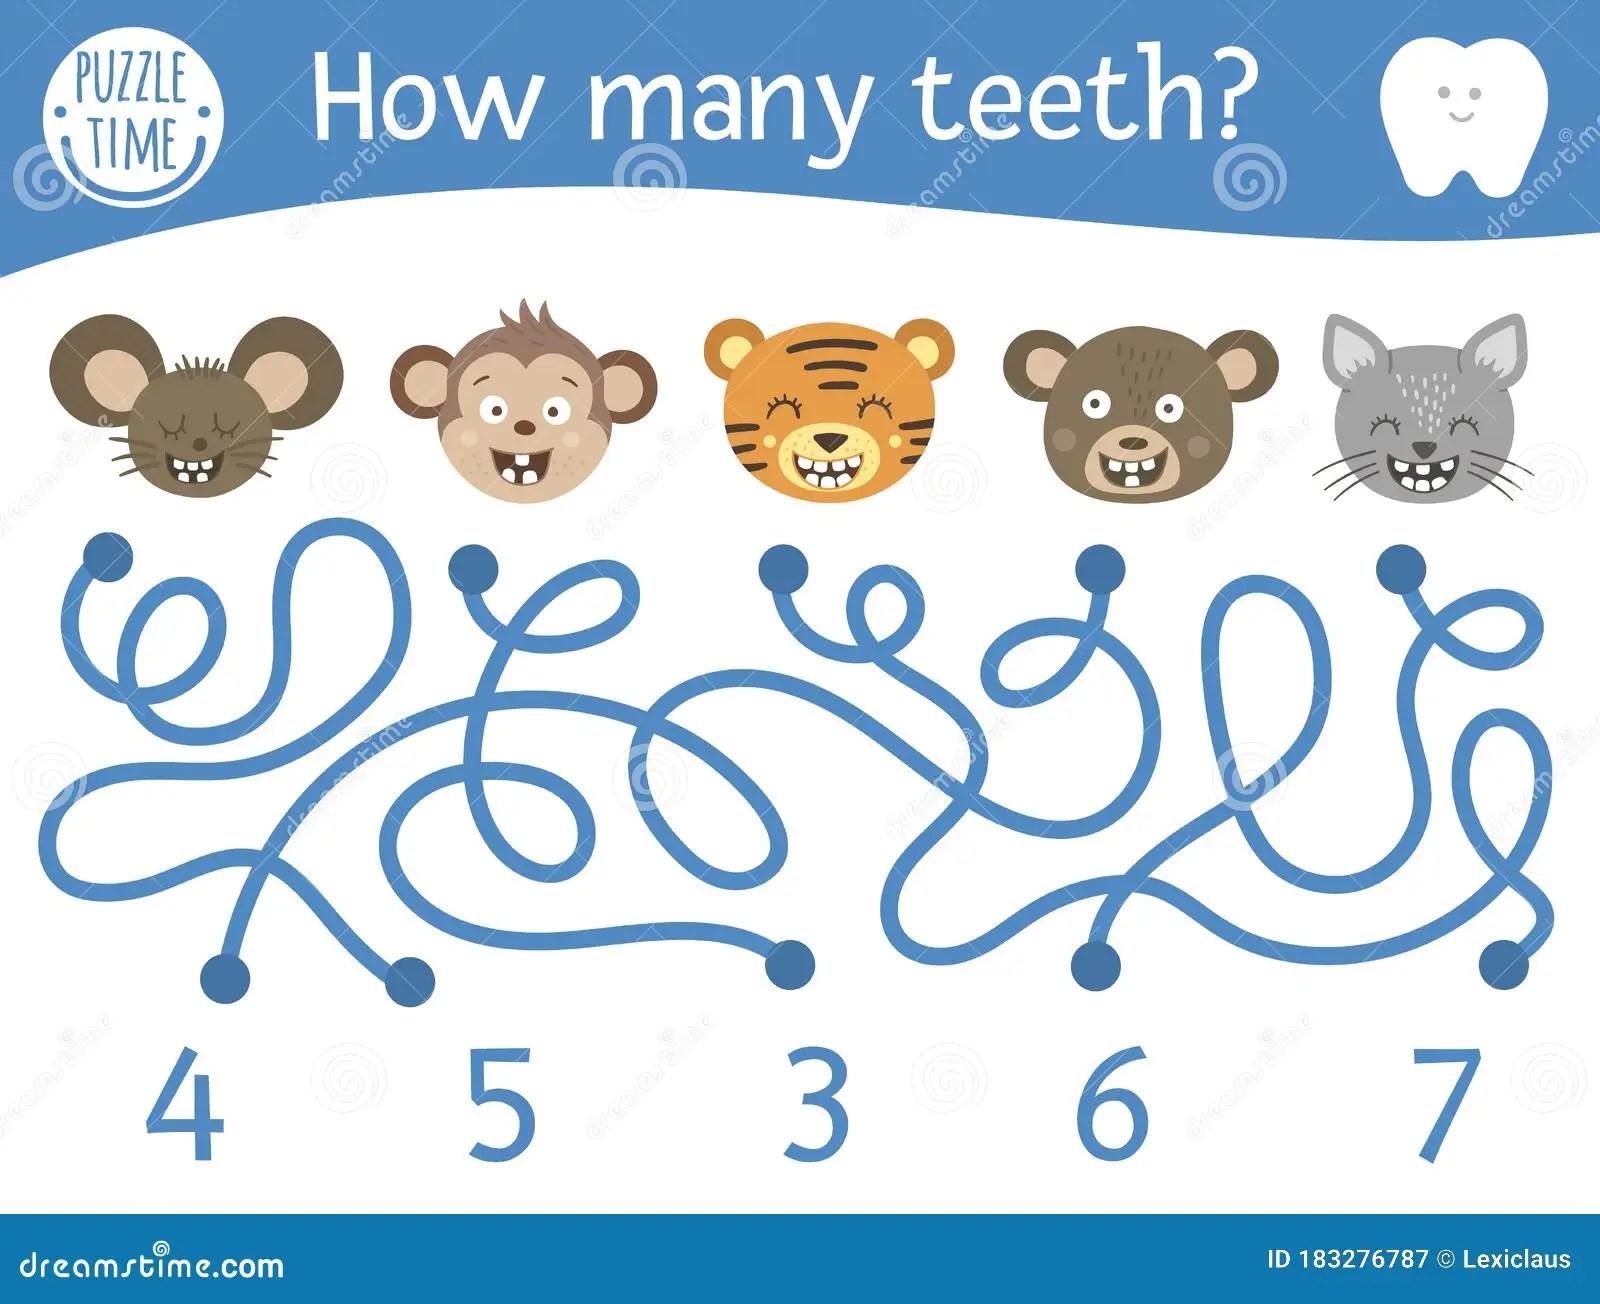 Dental Care Maze For Children Preschool Math Activity